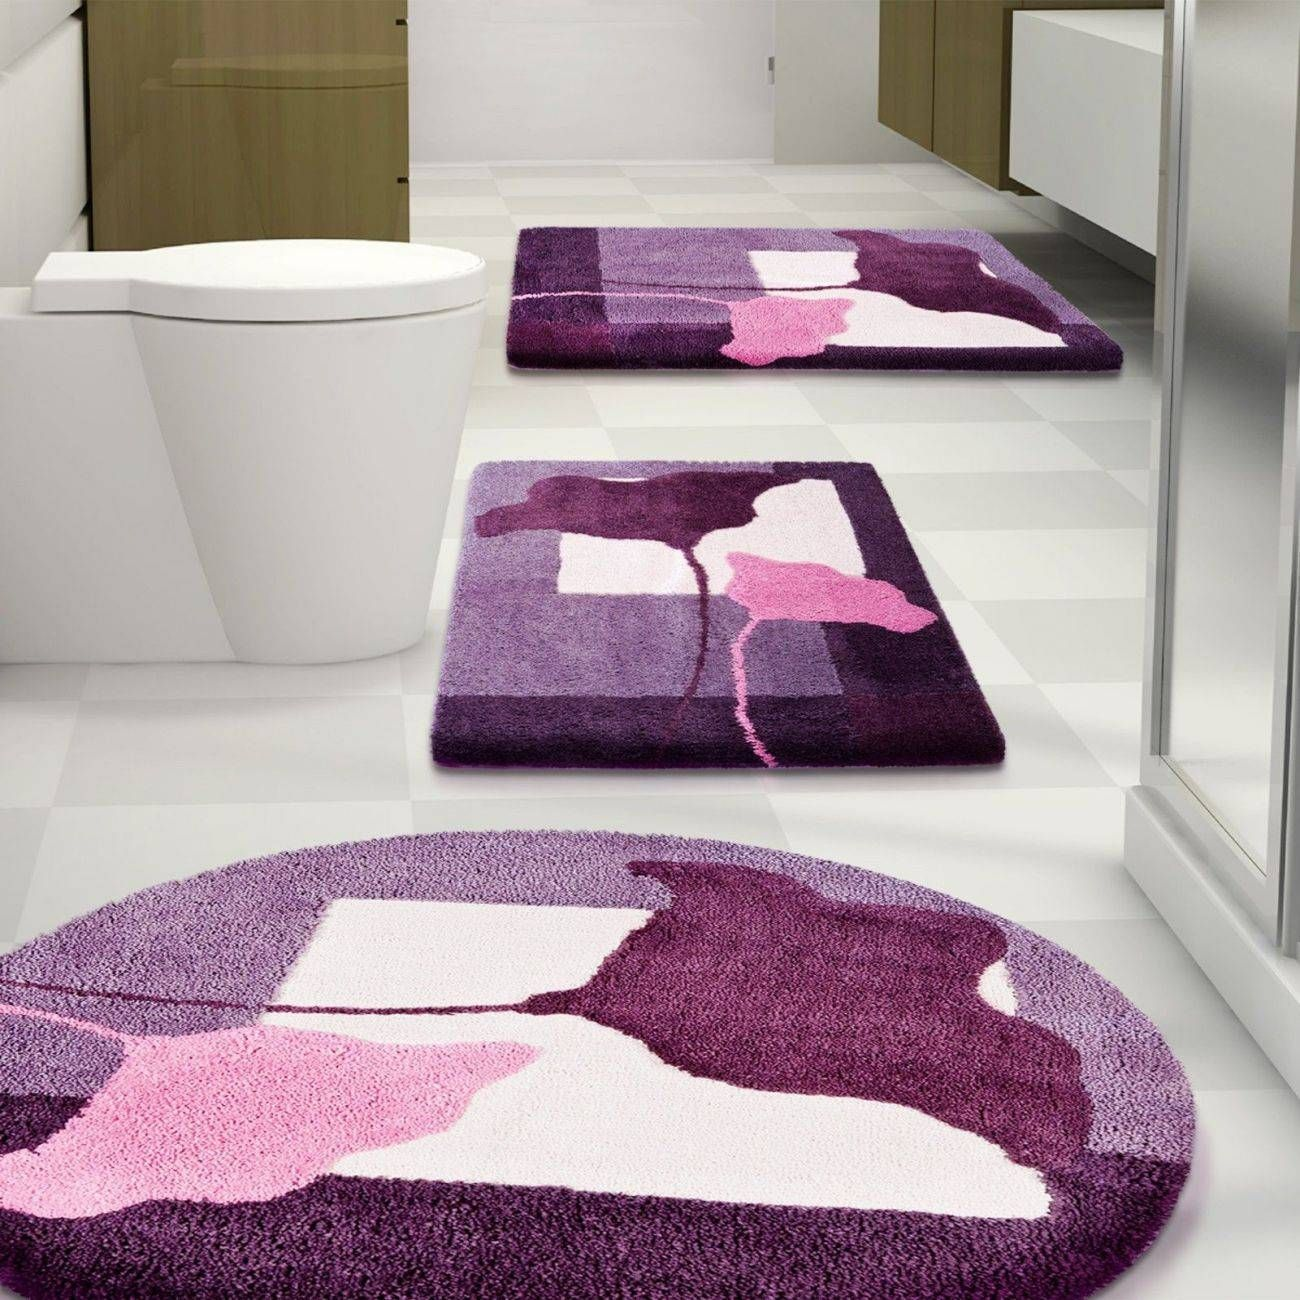 Awesome Purple Bathroom Accessory Sets